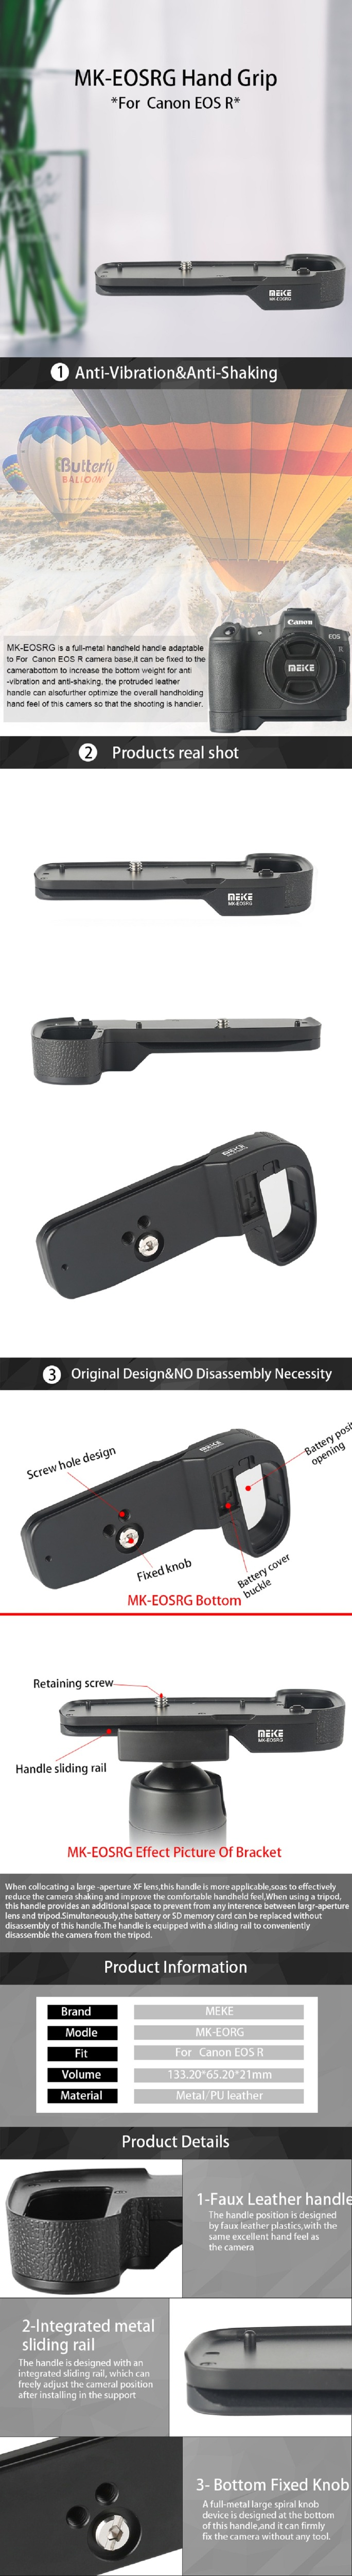 Meike MK-eosrg Full Metal Base L-PLACA Empuñadura Soporte para Cámara Canon EOSR M